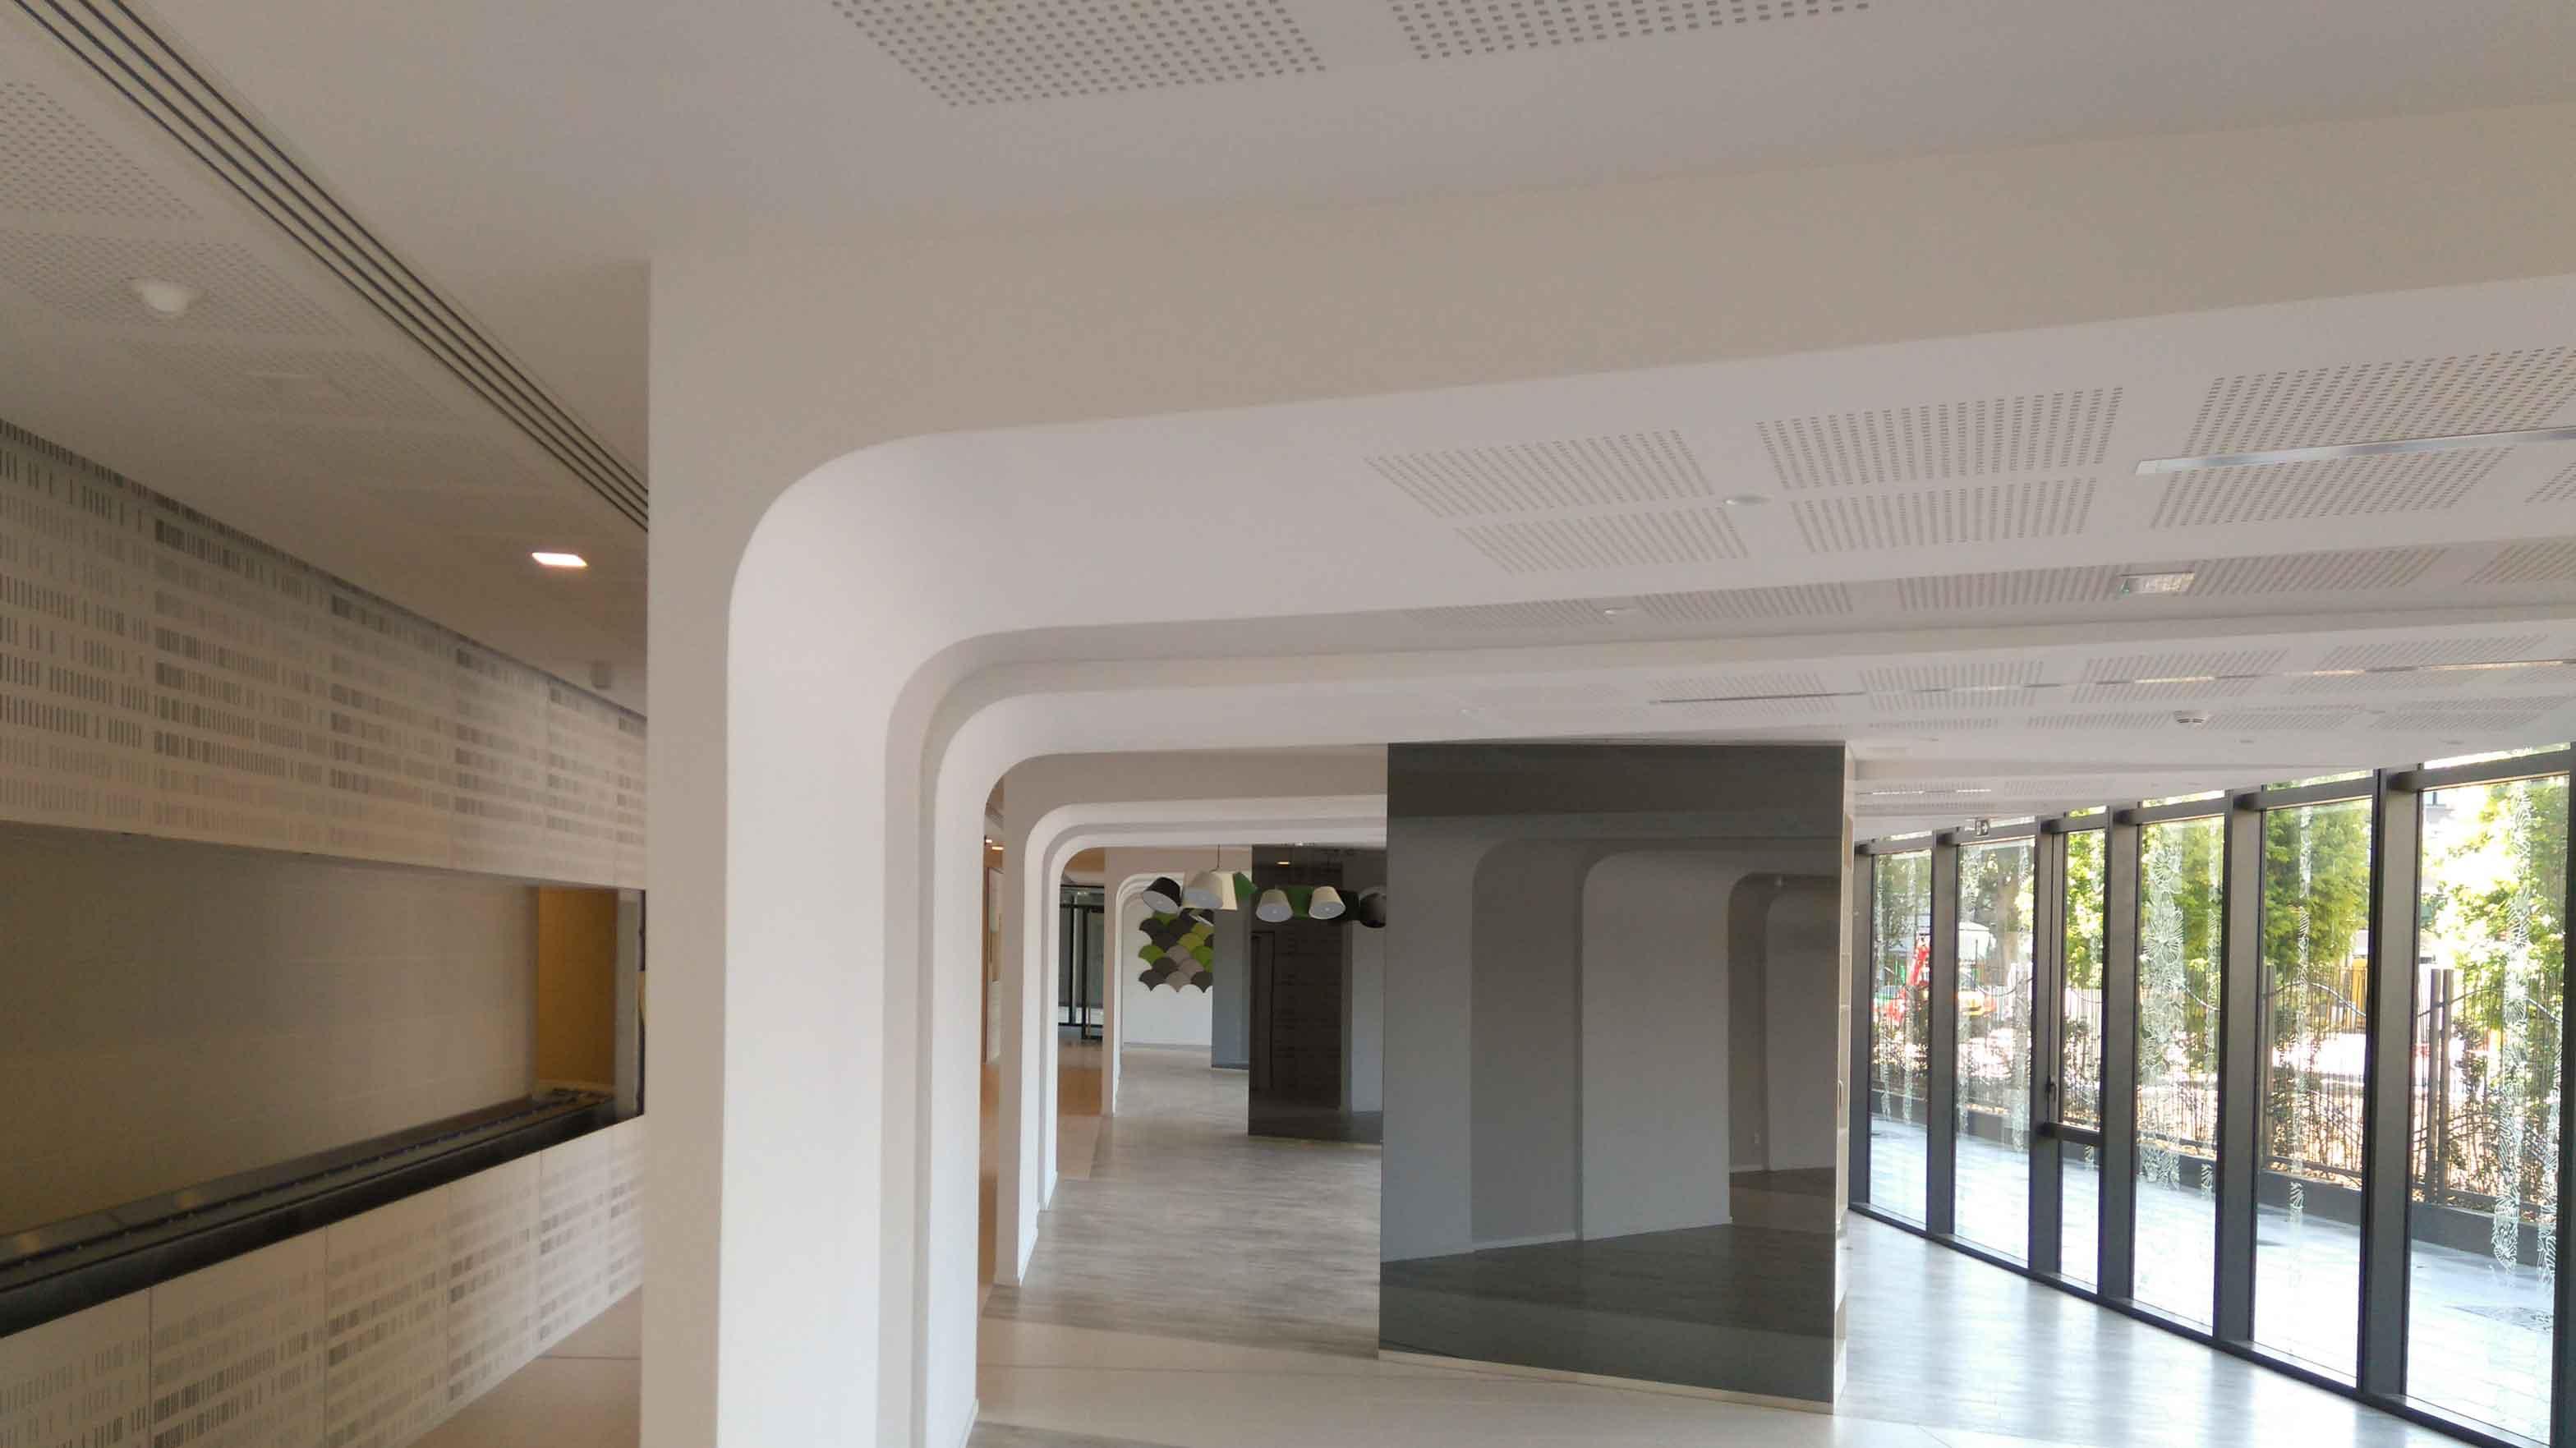 Plafond Gyptone Activ Air Quattro 41 Silvae Plafonds Acoustiques Miroir Langlois Sobreti Idf